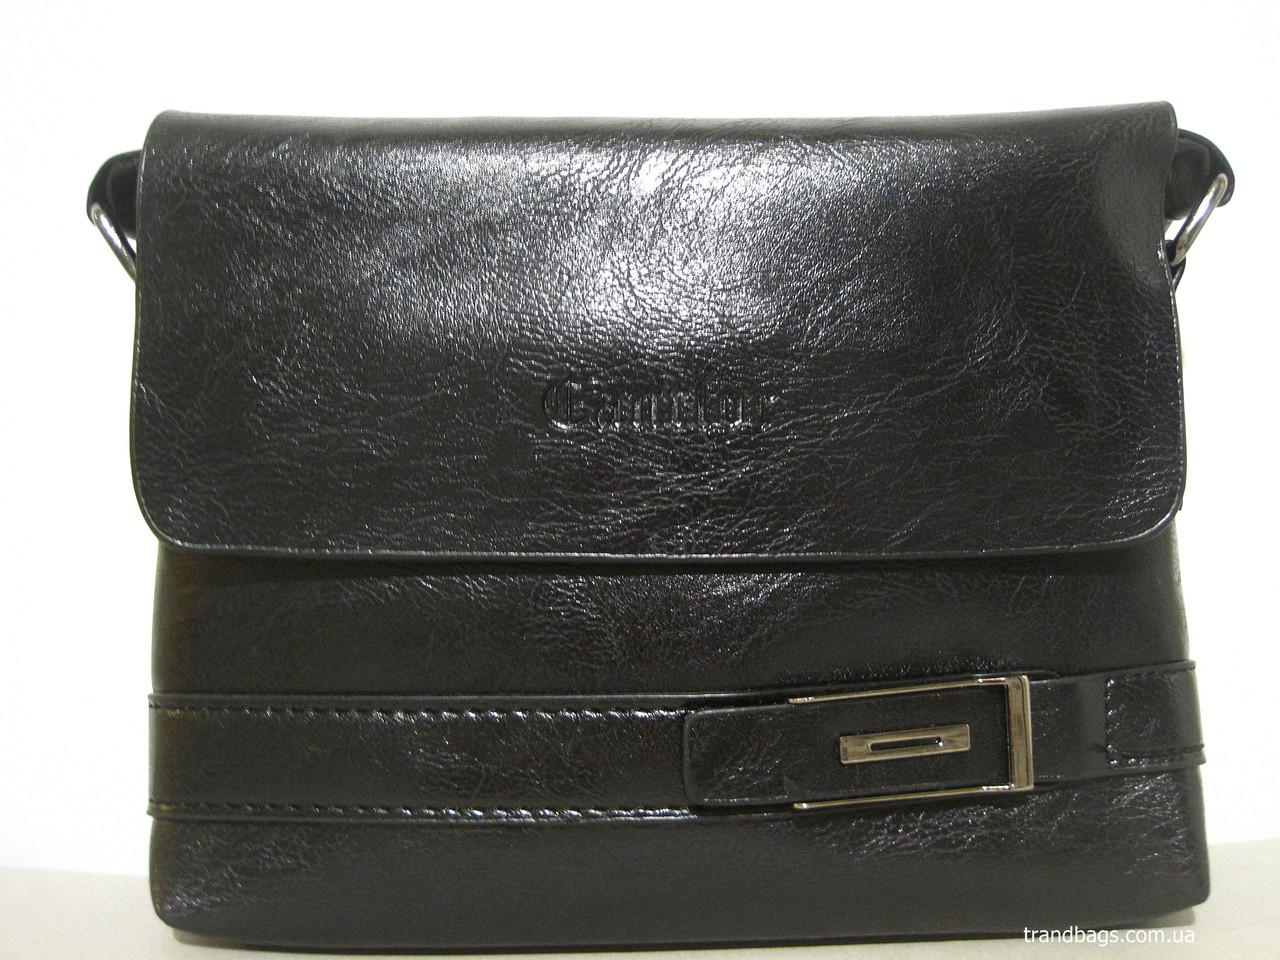 f02713cd8814 Мужская сумка 108S-1 black CANTLOR мужская сумка на плечо не дорого Одесса  7 км